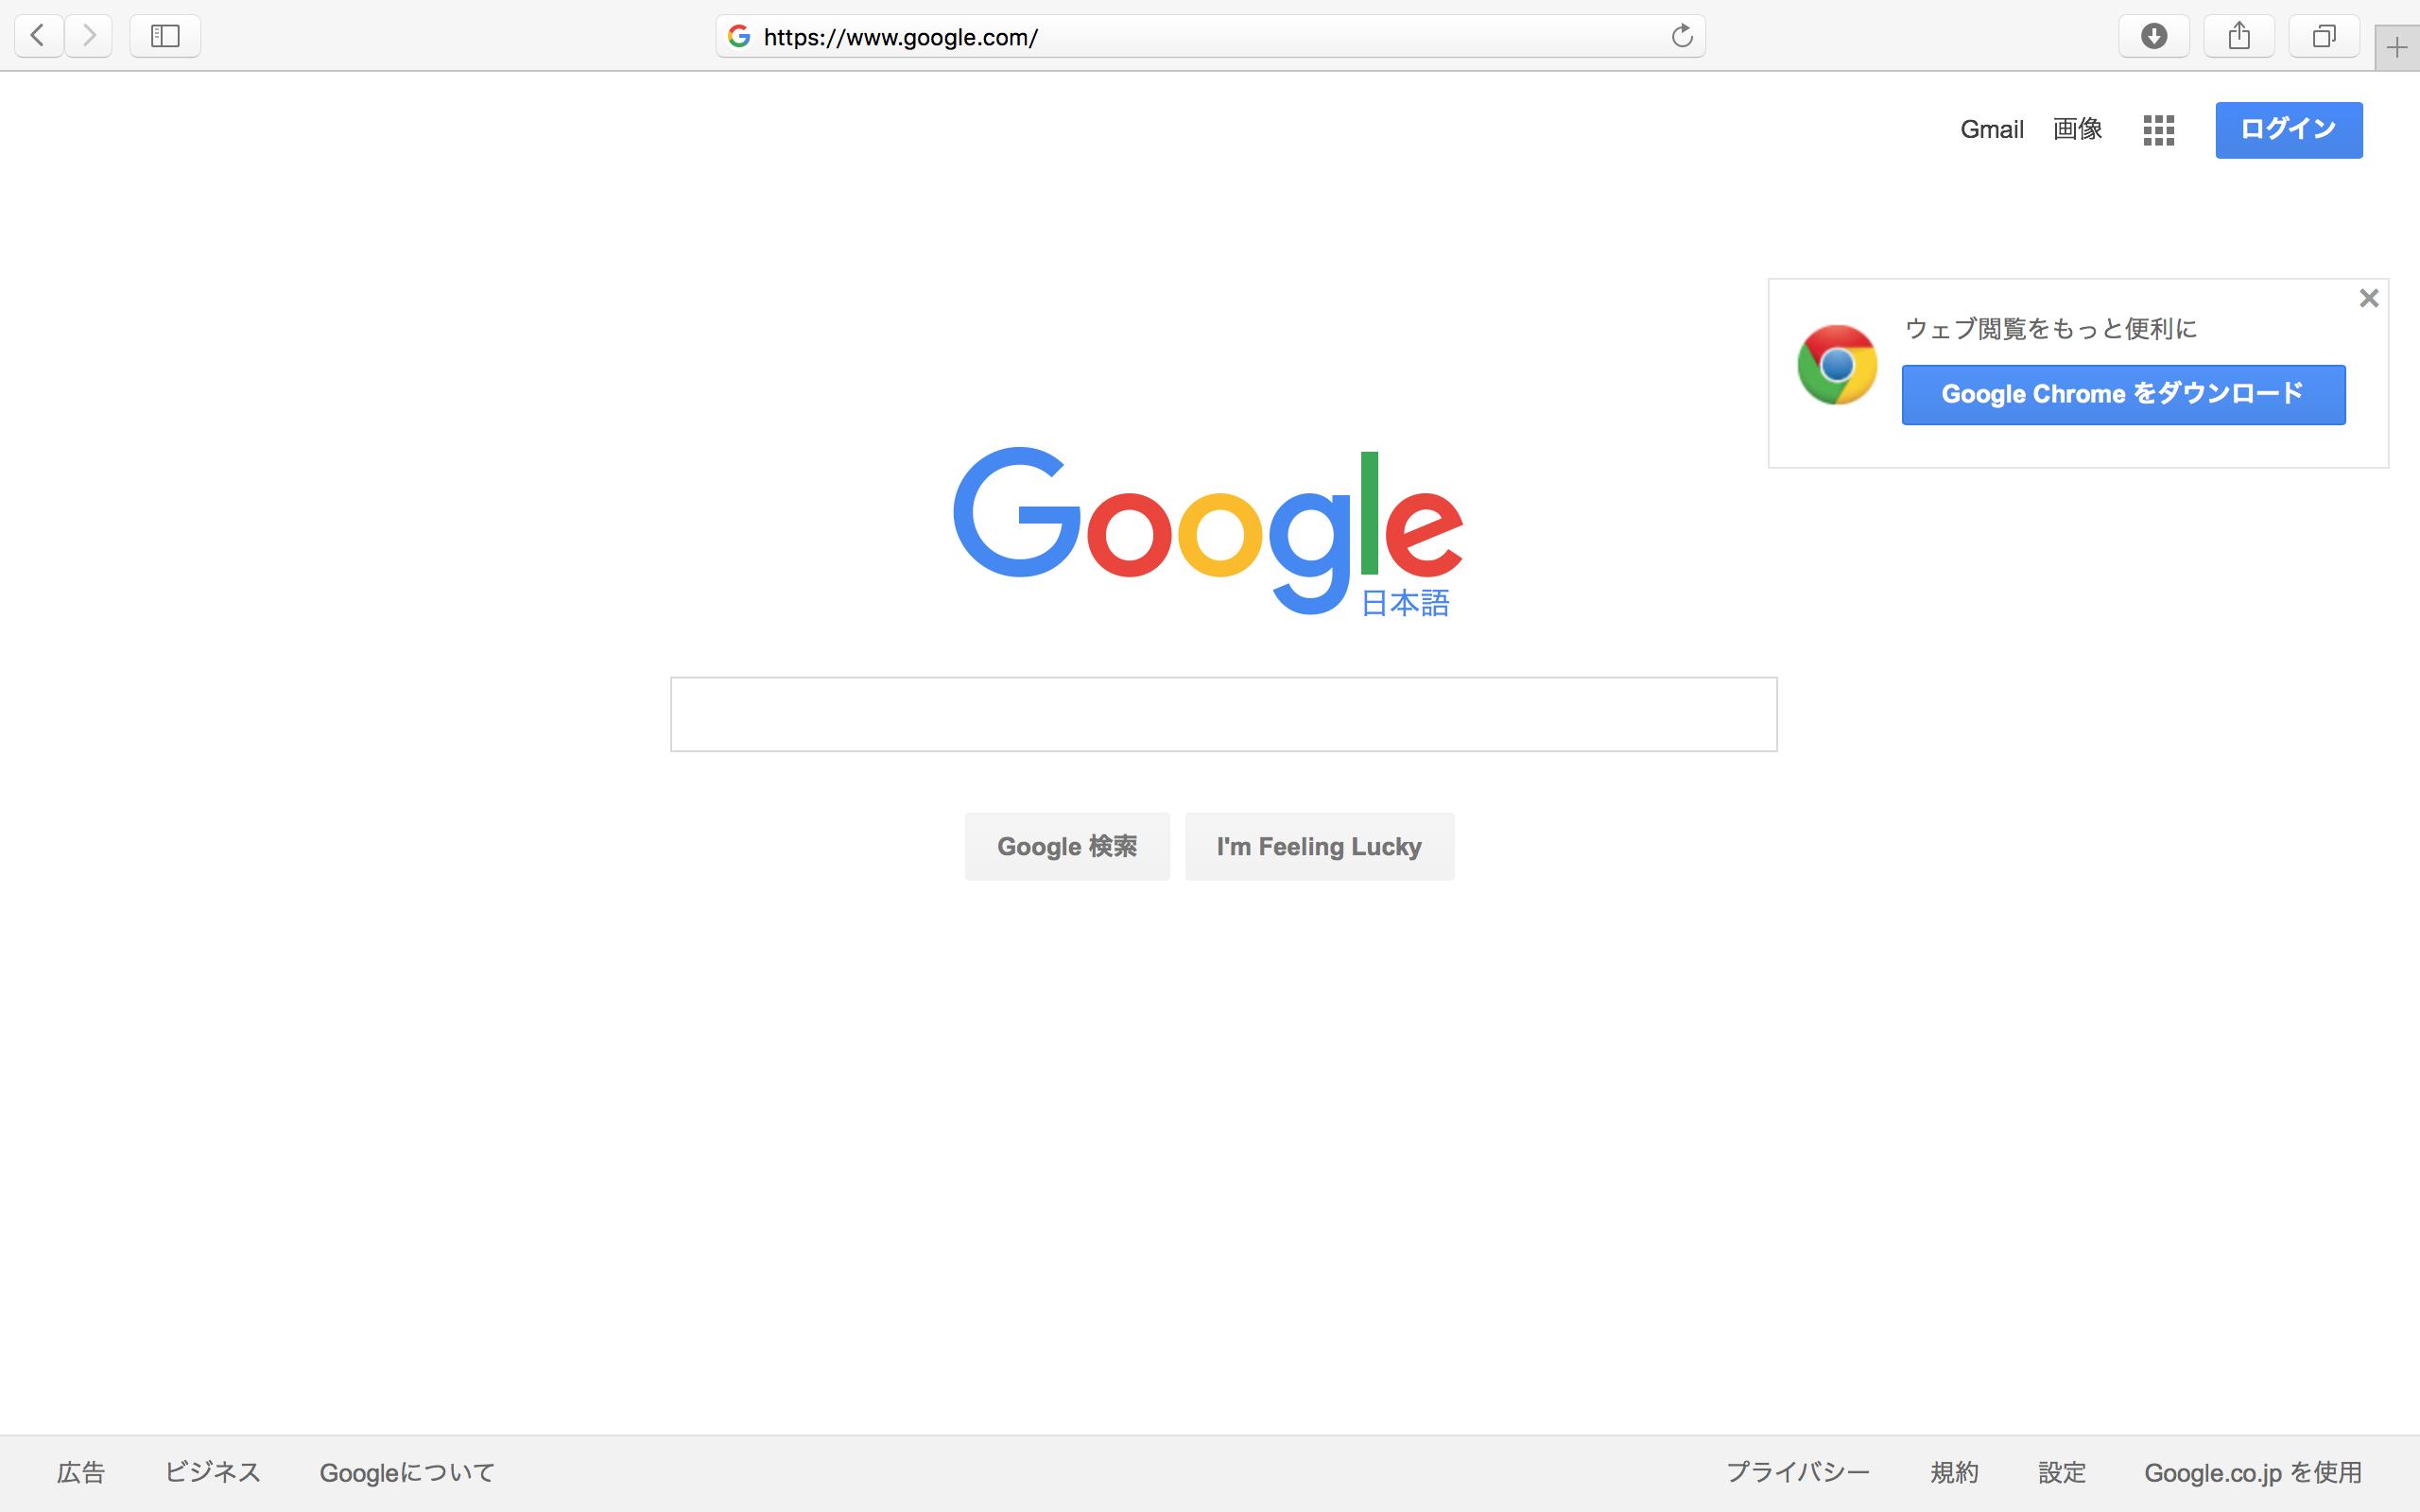 2015 Interbrand -  Google